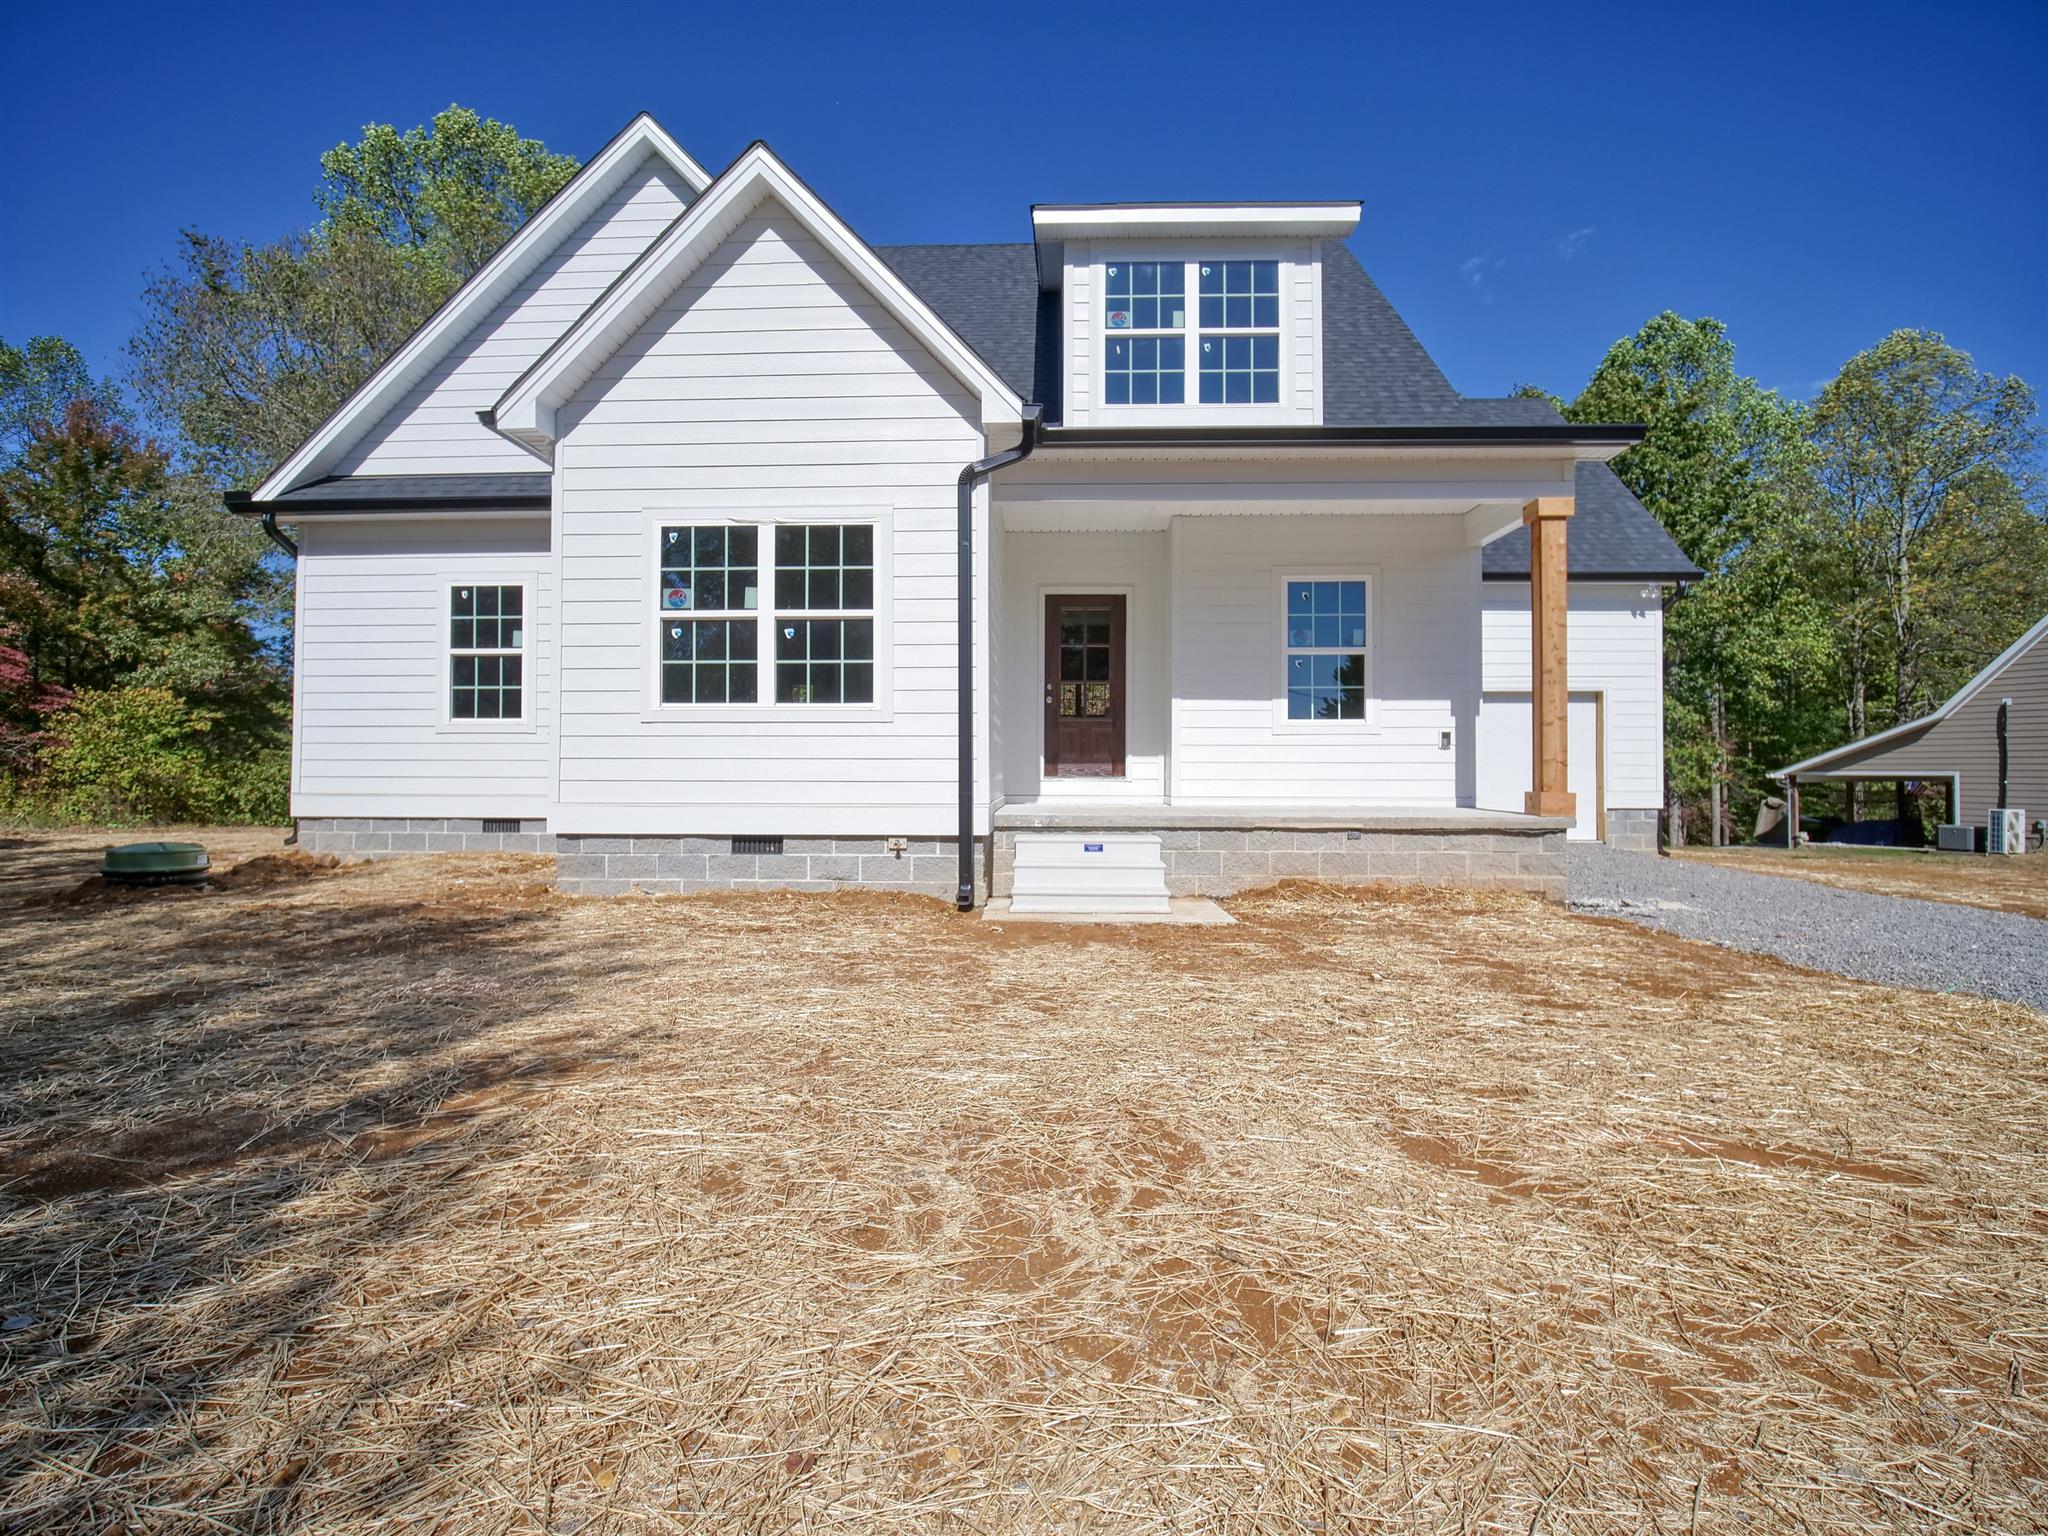 105 SHILOH LANE, Smithville, TN 37166 - Smithville, TN real estate listing